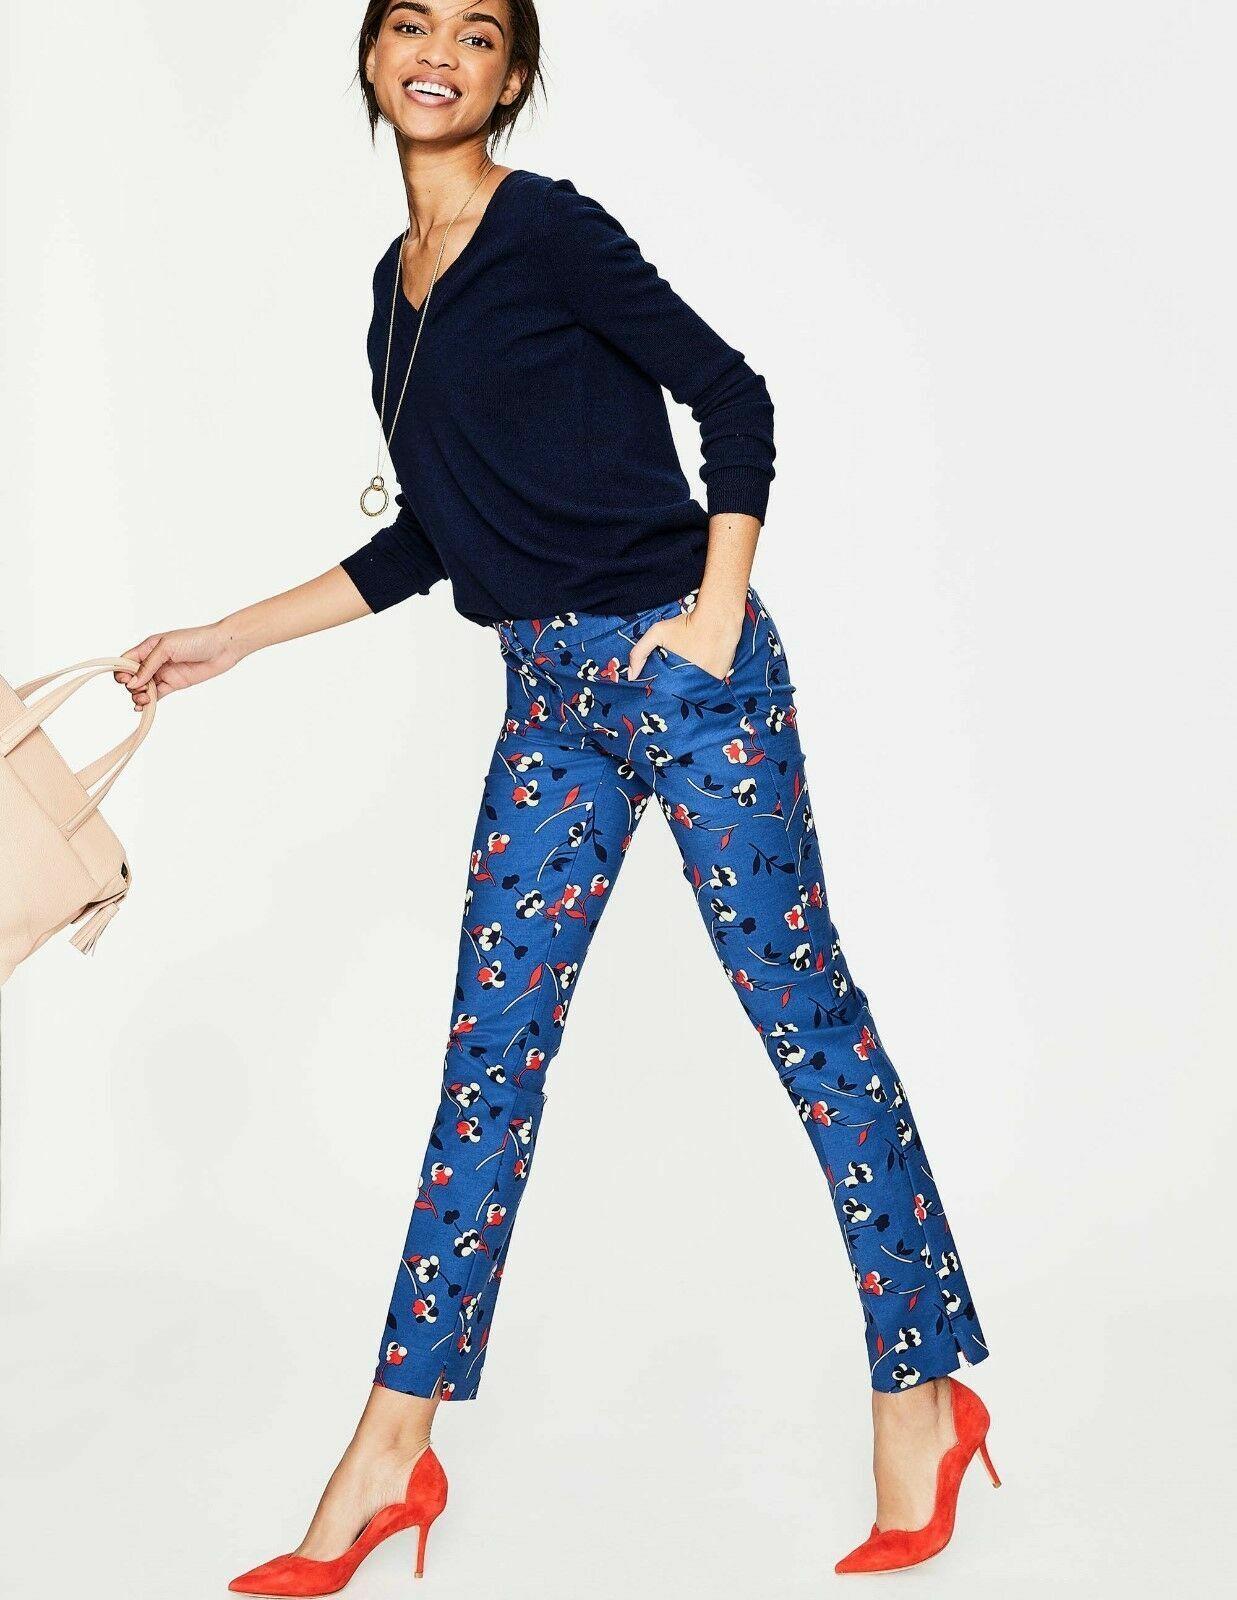 Boden Richmond Trousers Riviera bluee Wildflower Size 12 Regular Bnwt